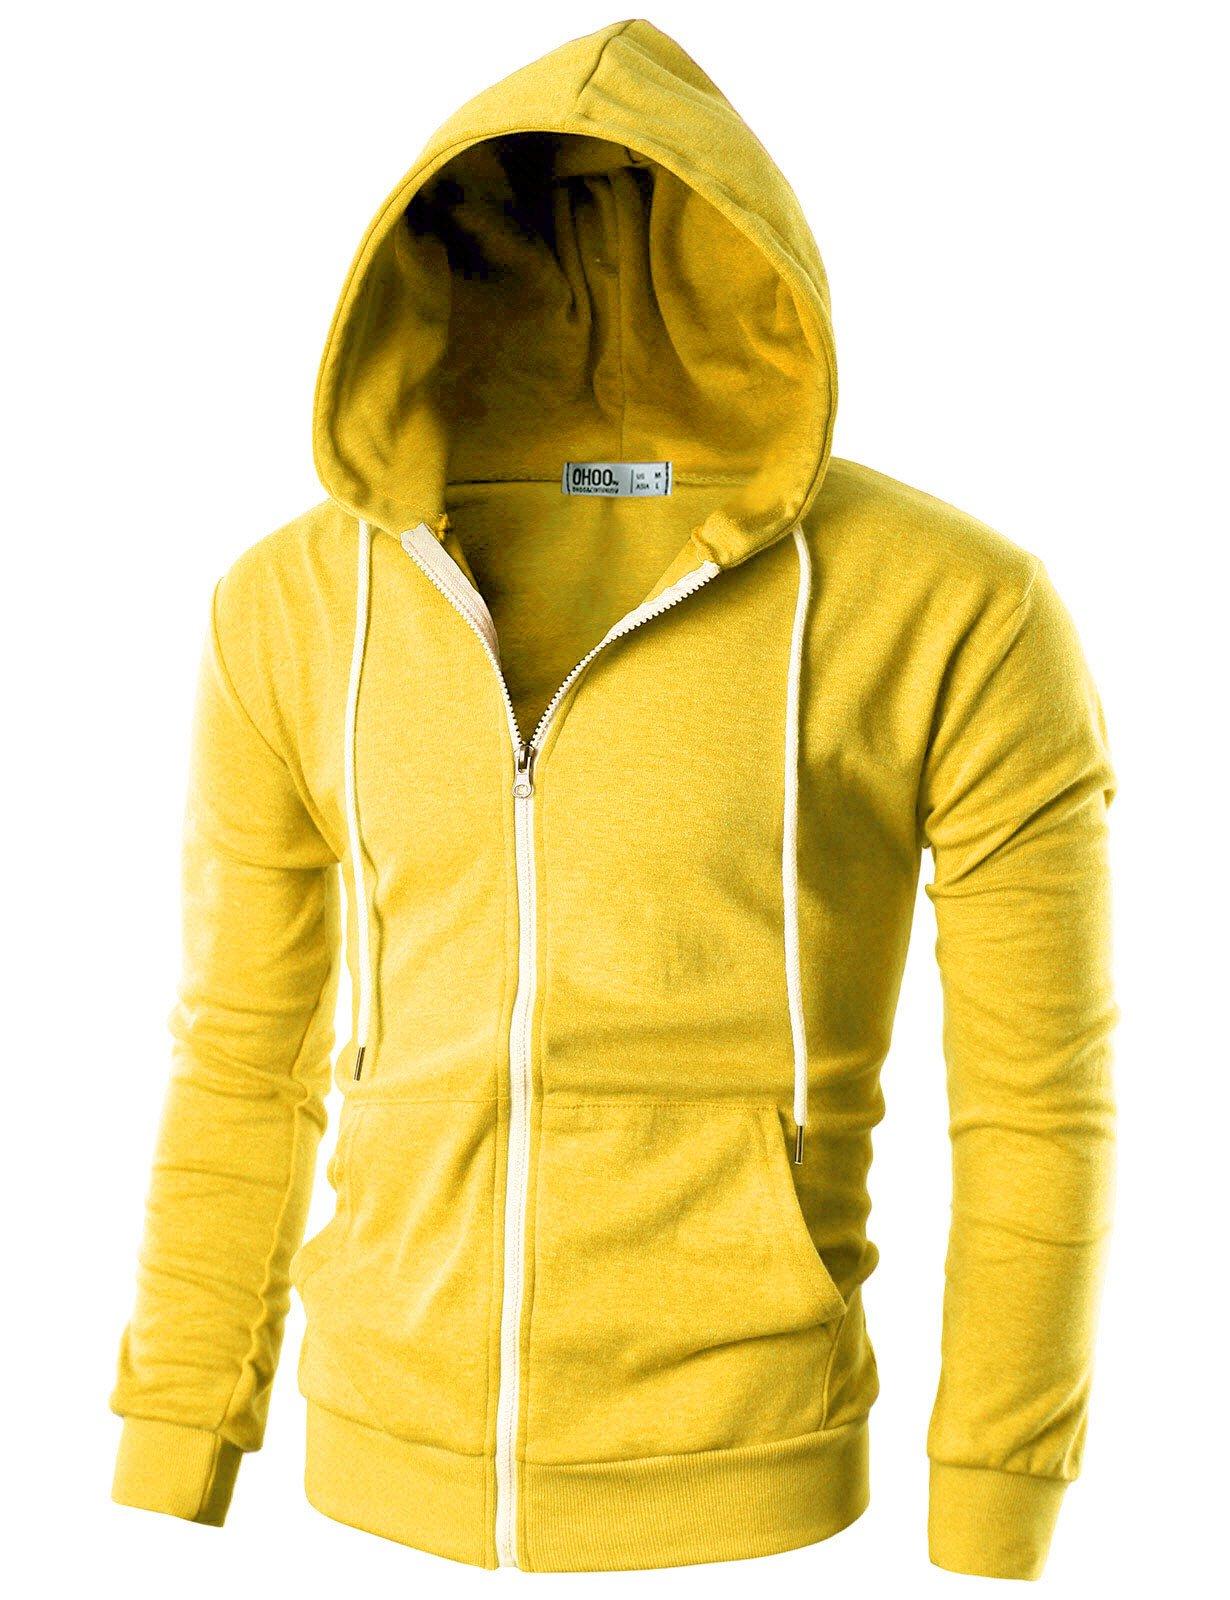 GIVON Mens Slim Fit Long Sleeve Lightweight Zip-up Hoodie with Kanga Pocket/DCF035-YELLOW-S